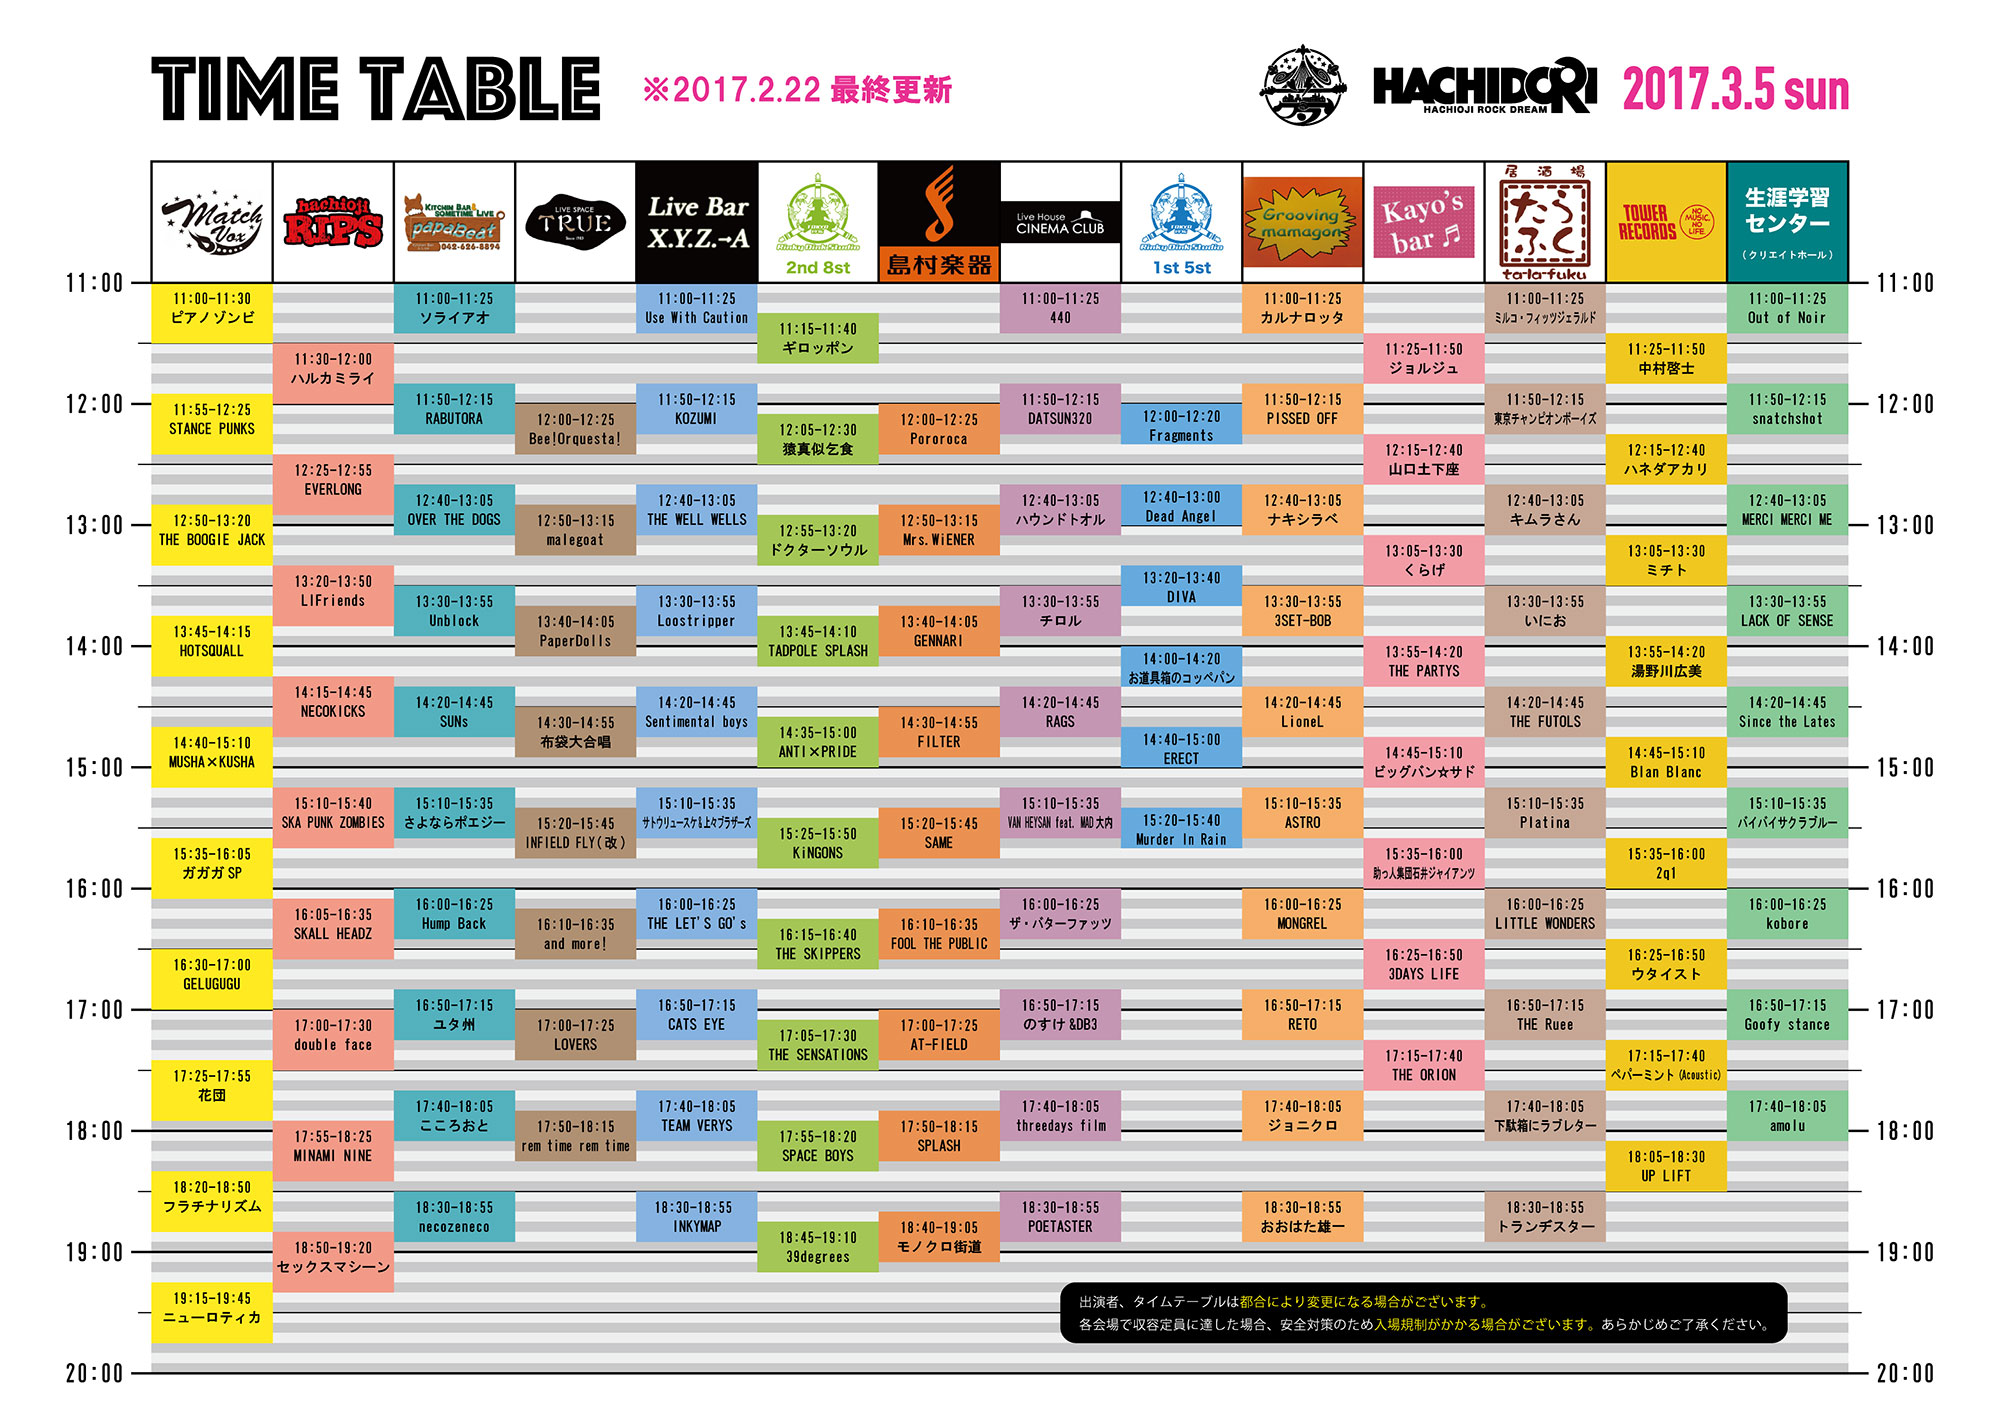 HACHIDORI_timetable